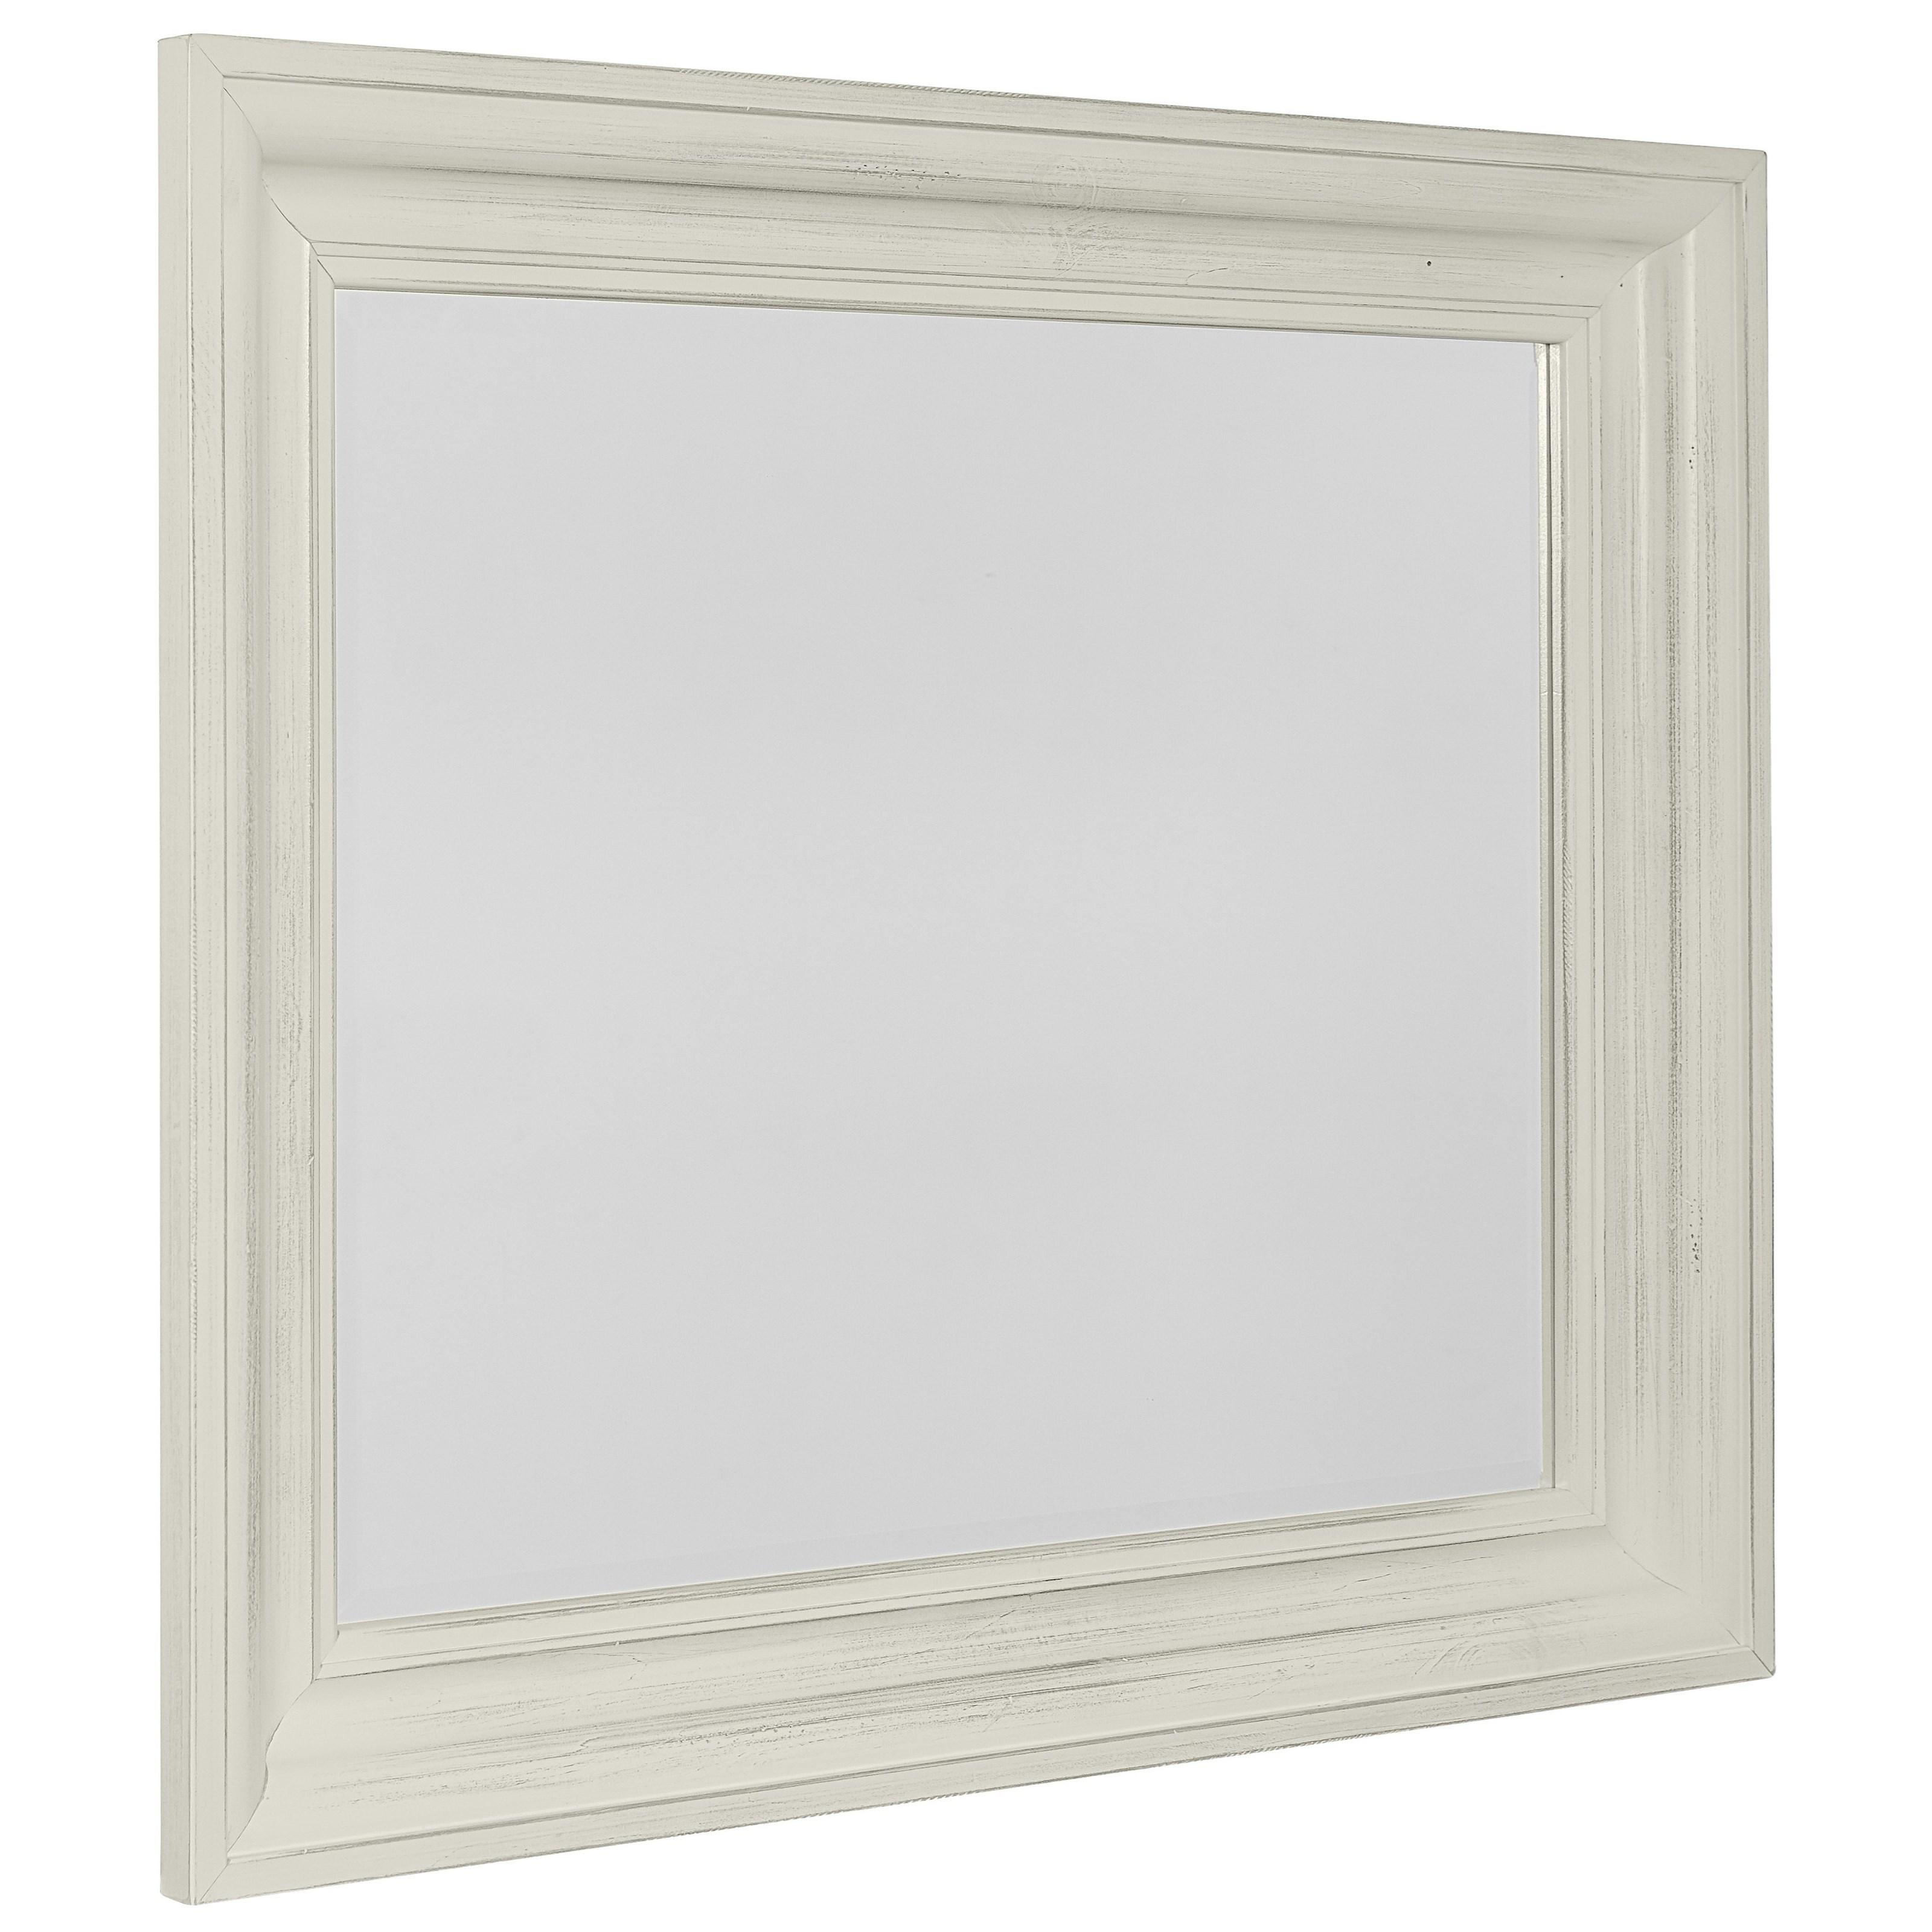 Shadowbox Mirror - Beveled Glass